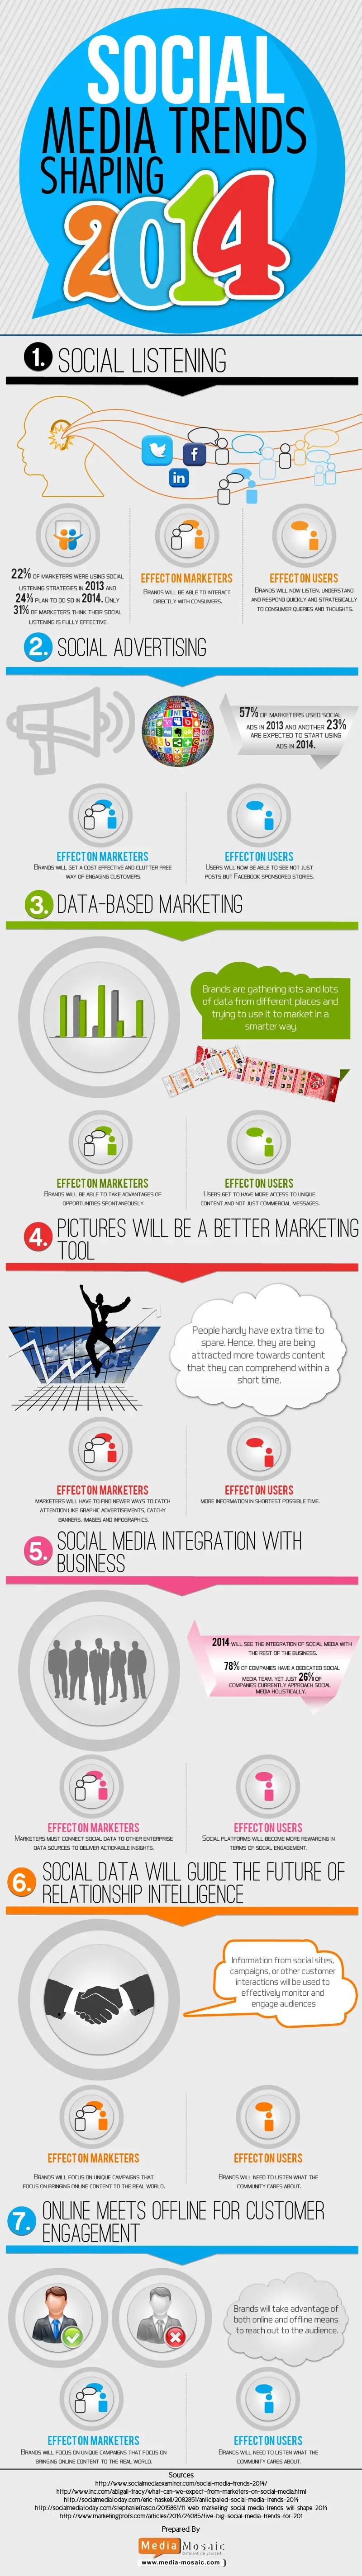 social-media-trends-2014-infographic